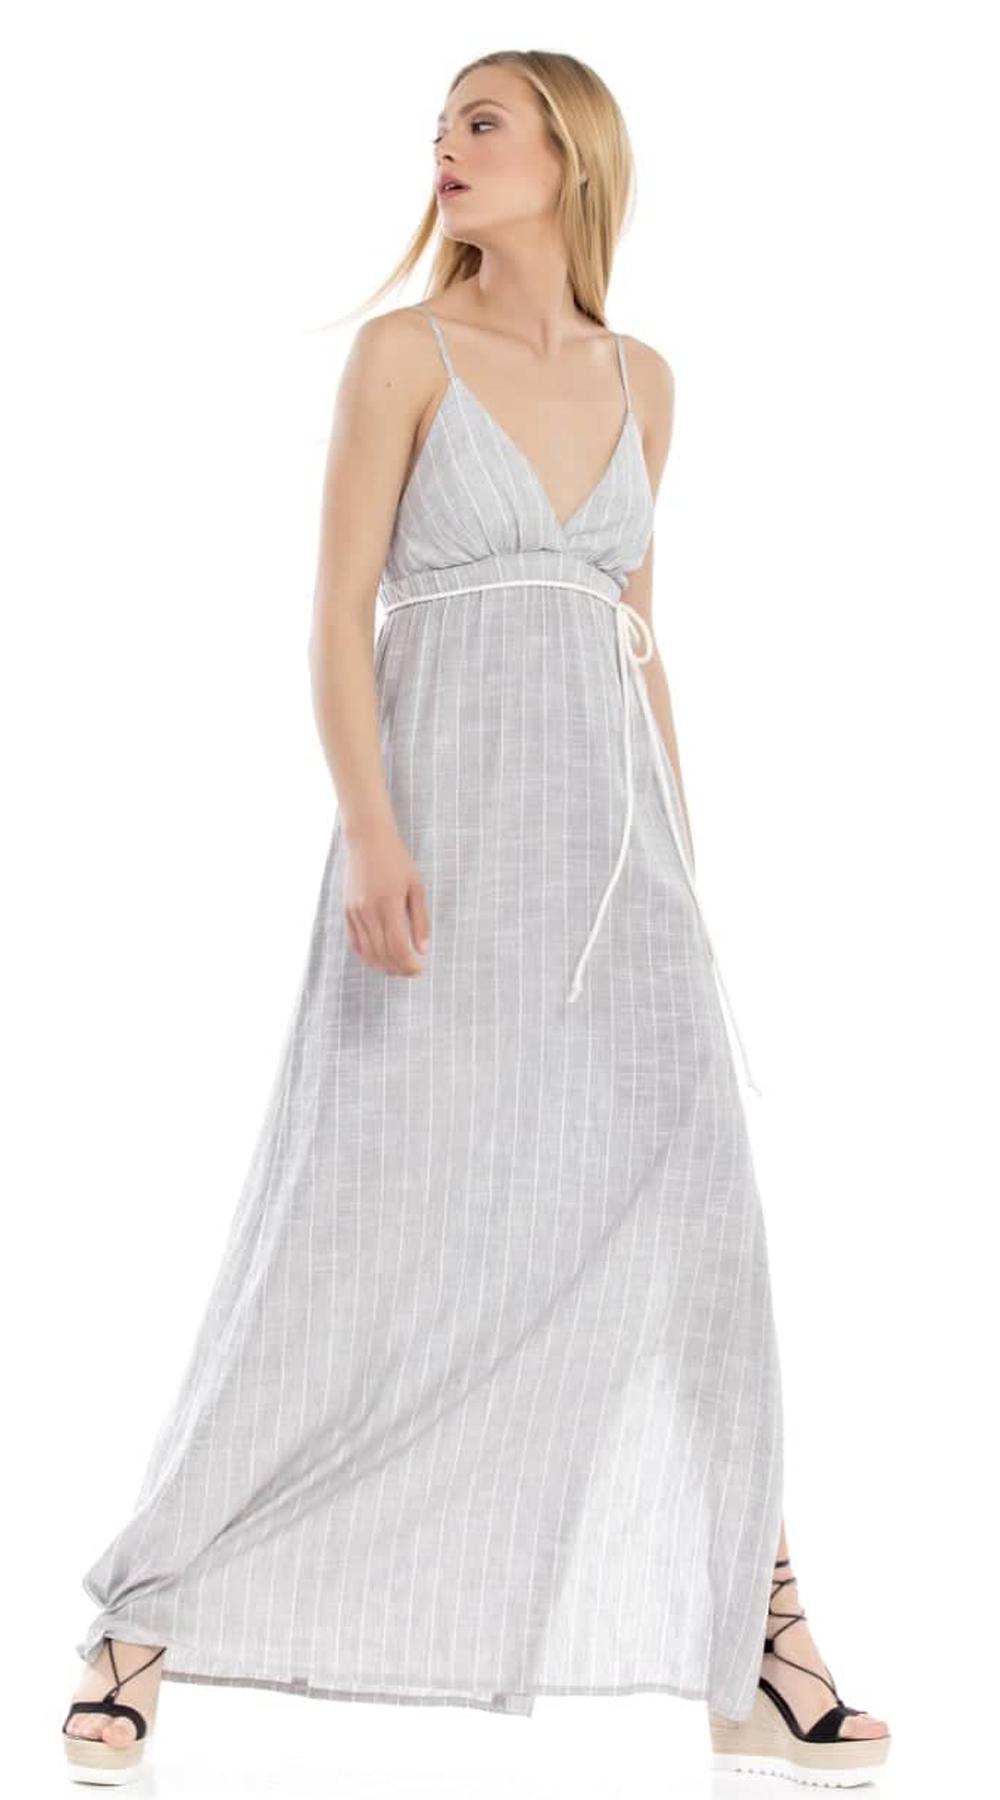 b631b66711b1 Μάξι Σατινέ Φόρεμα Online ONLINE S17ON 5094578 φορέματα βραδυνά φορέματα